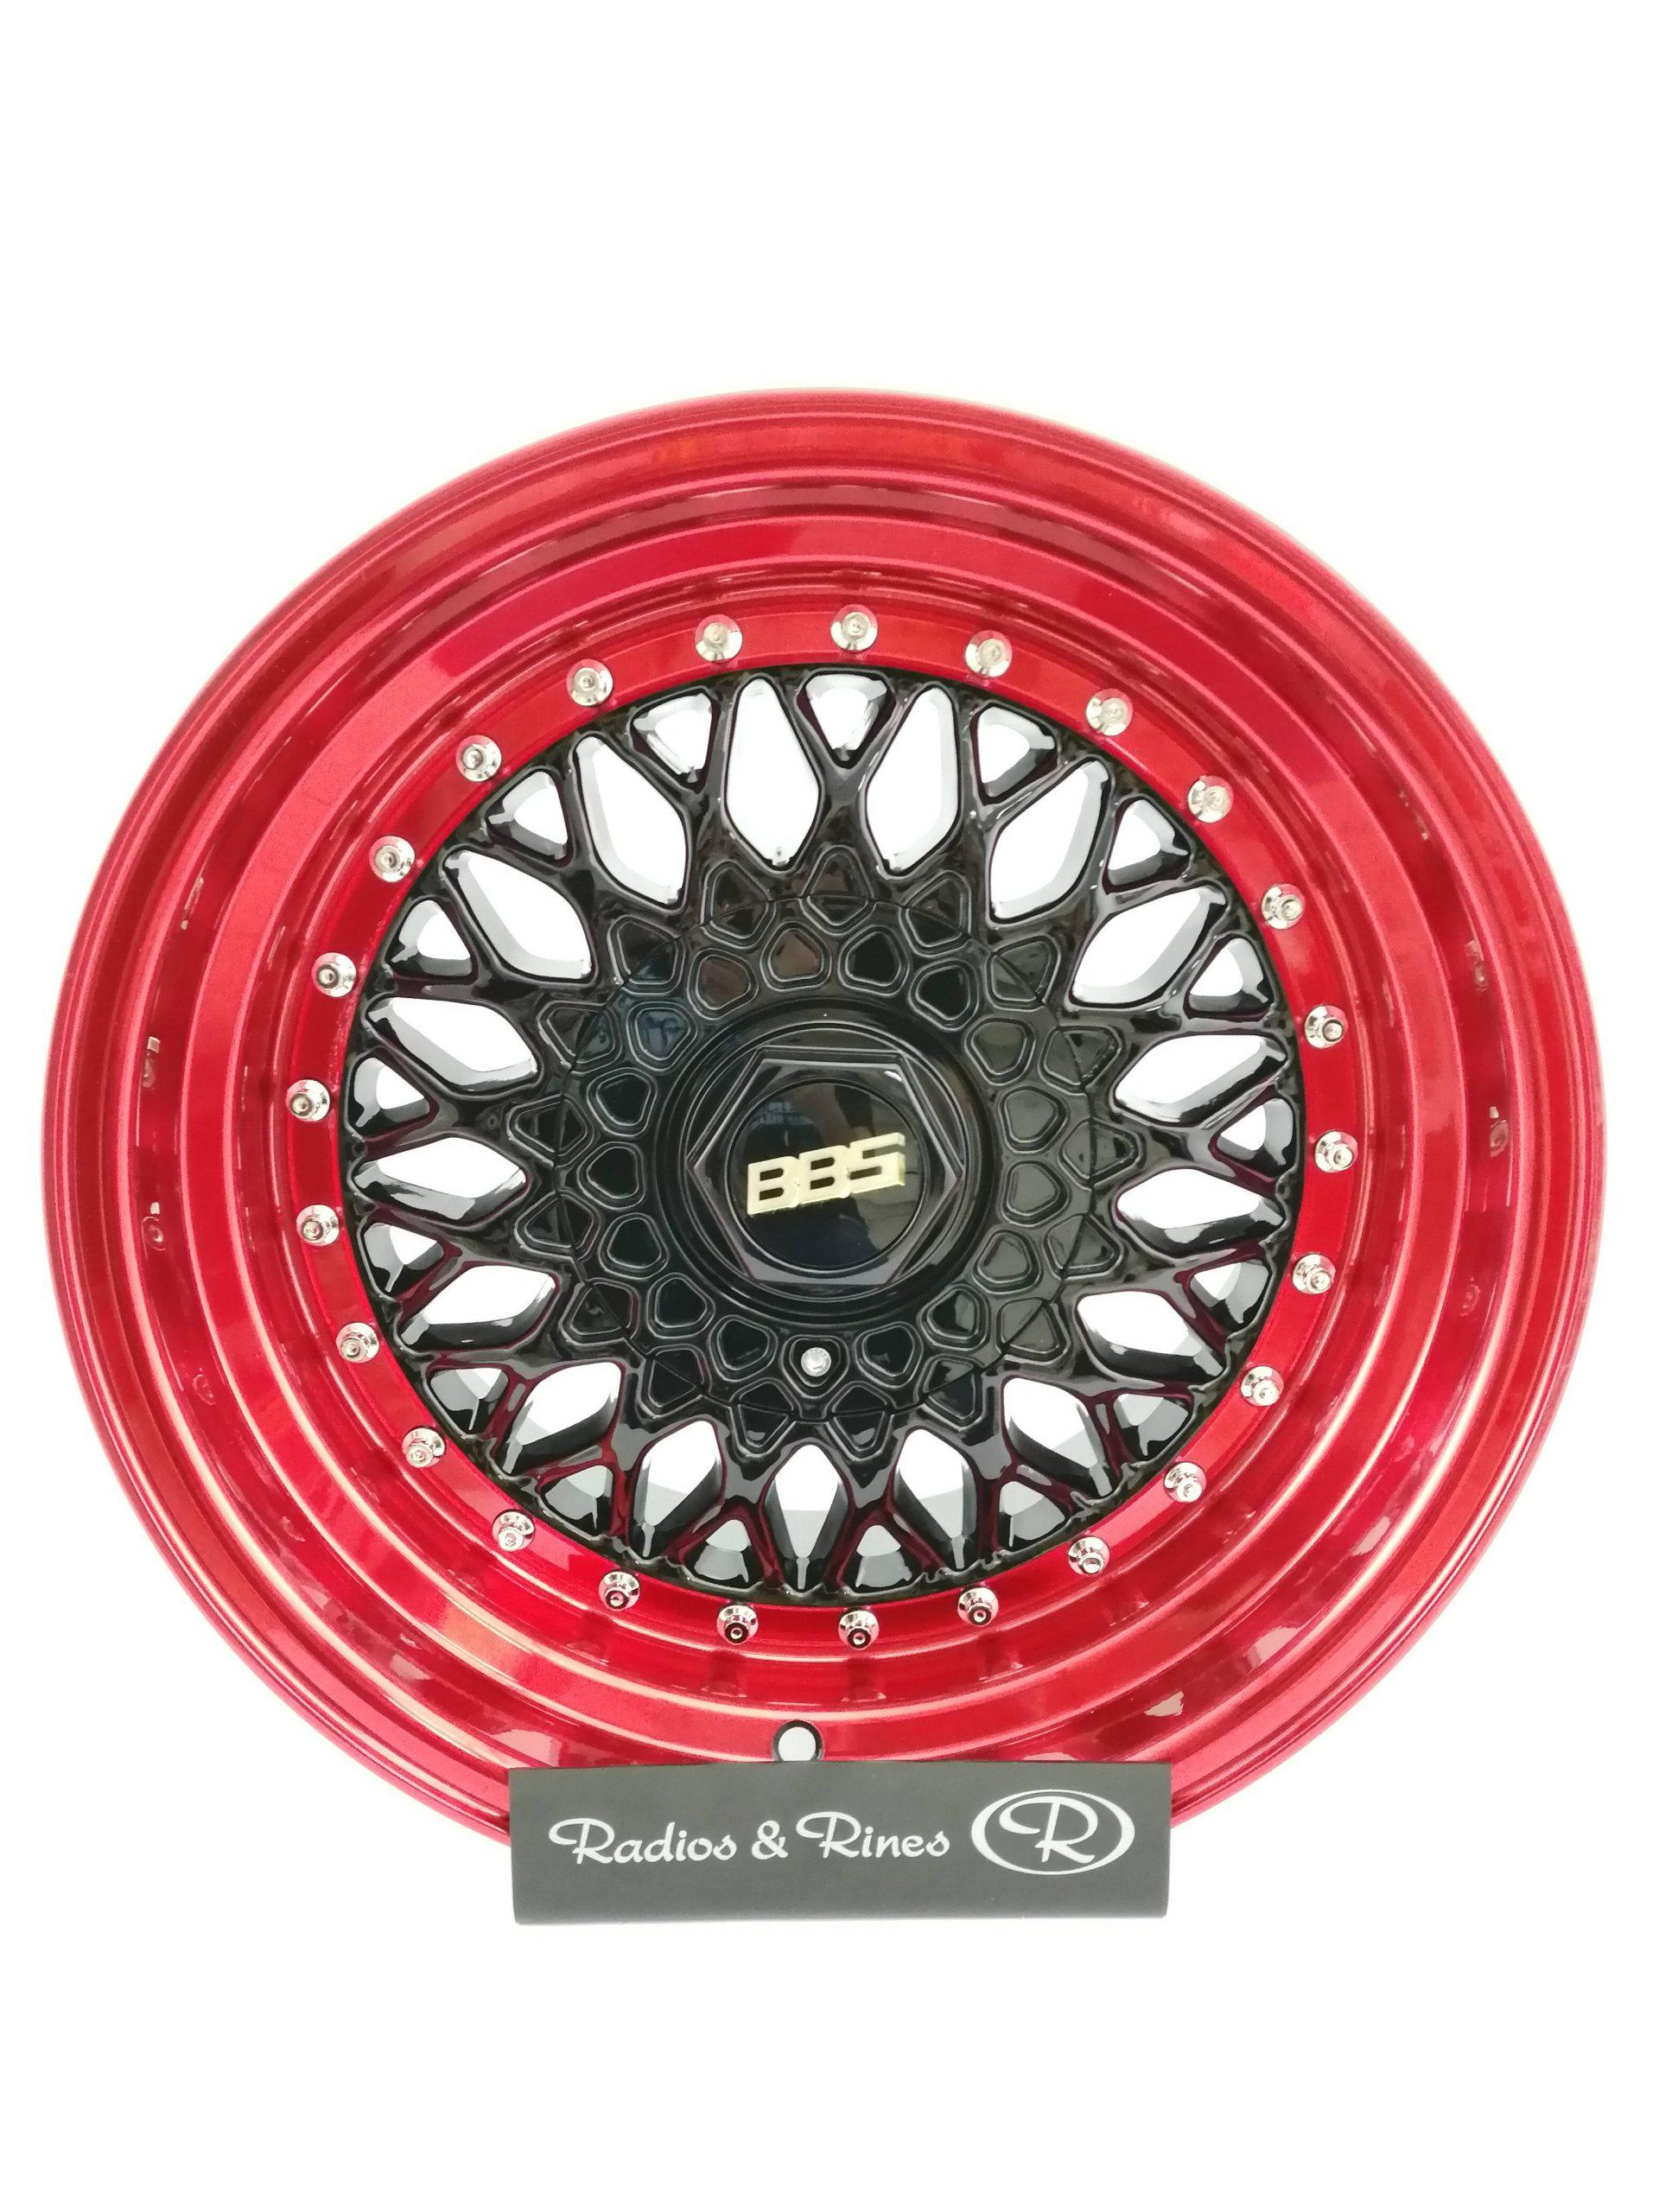 RIN RACER 135 R16X9 4H 100/114.3 BLACK POLISH LIP RED CLEAR